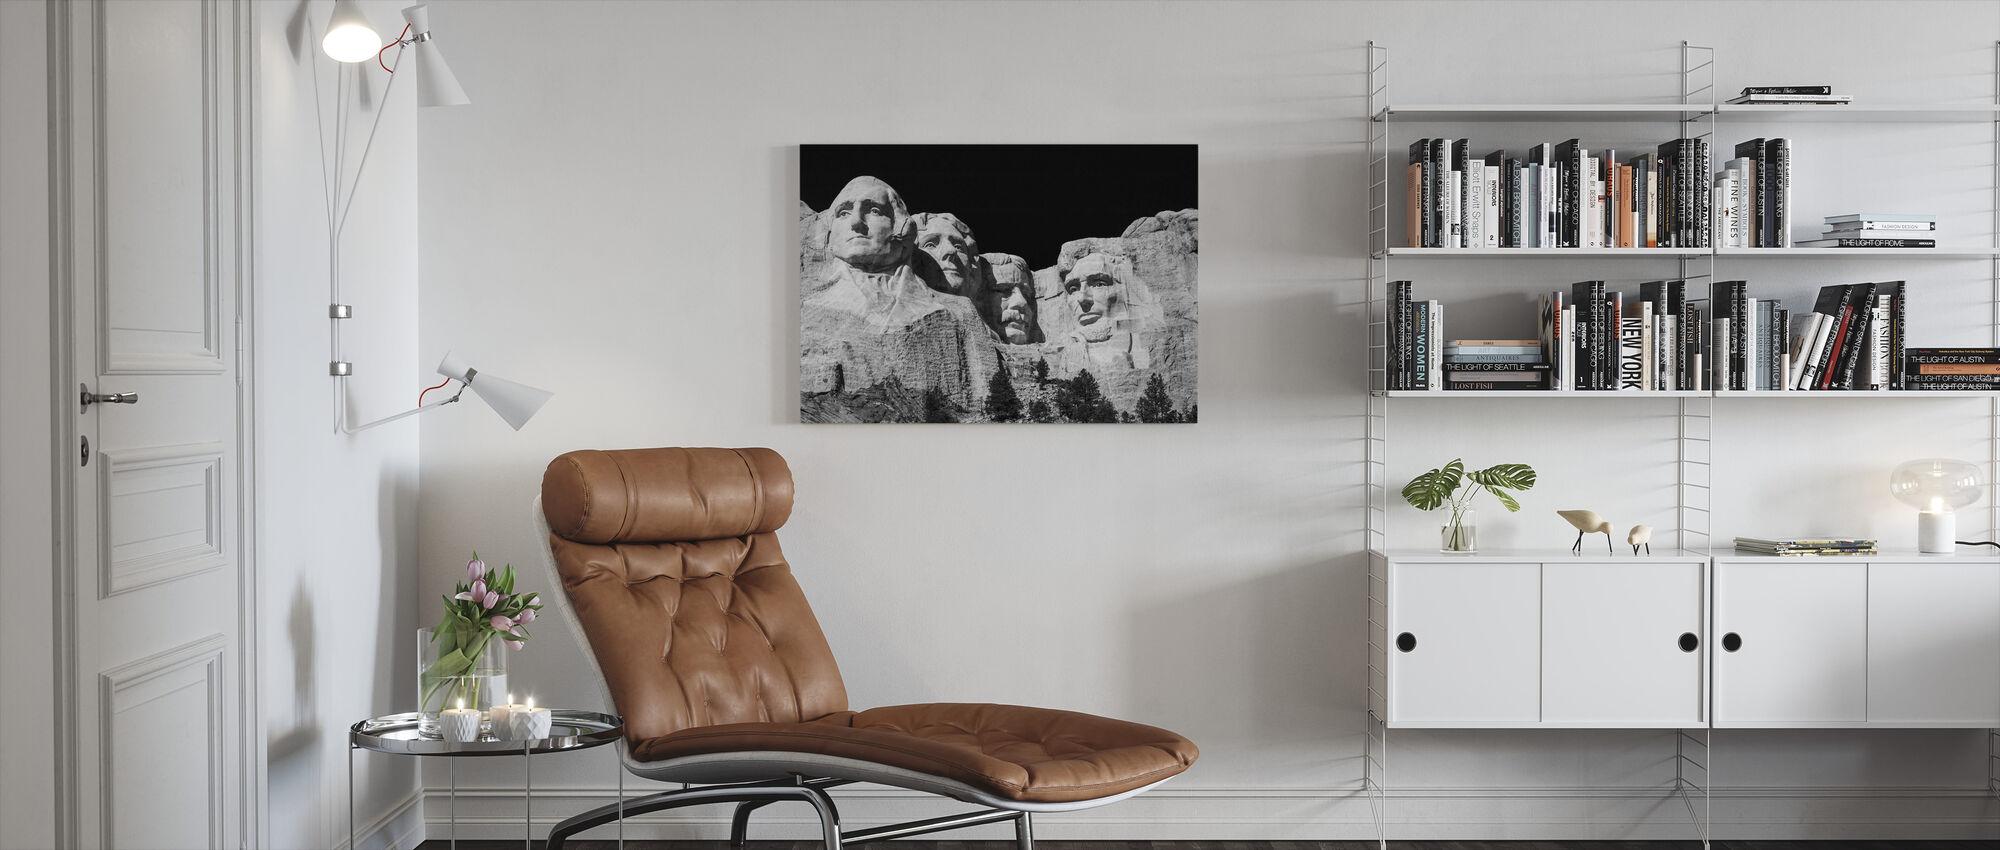 Mount Rushmore - Canvastavla - Vardagsrum